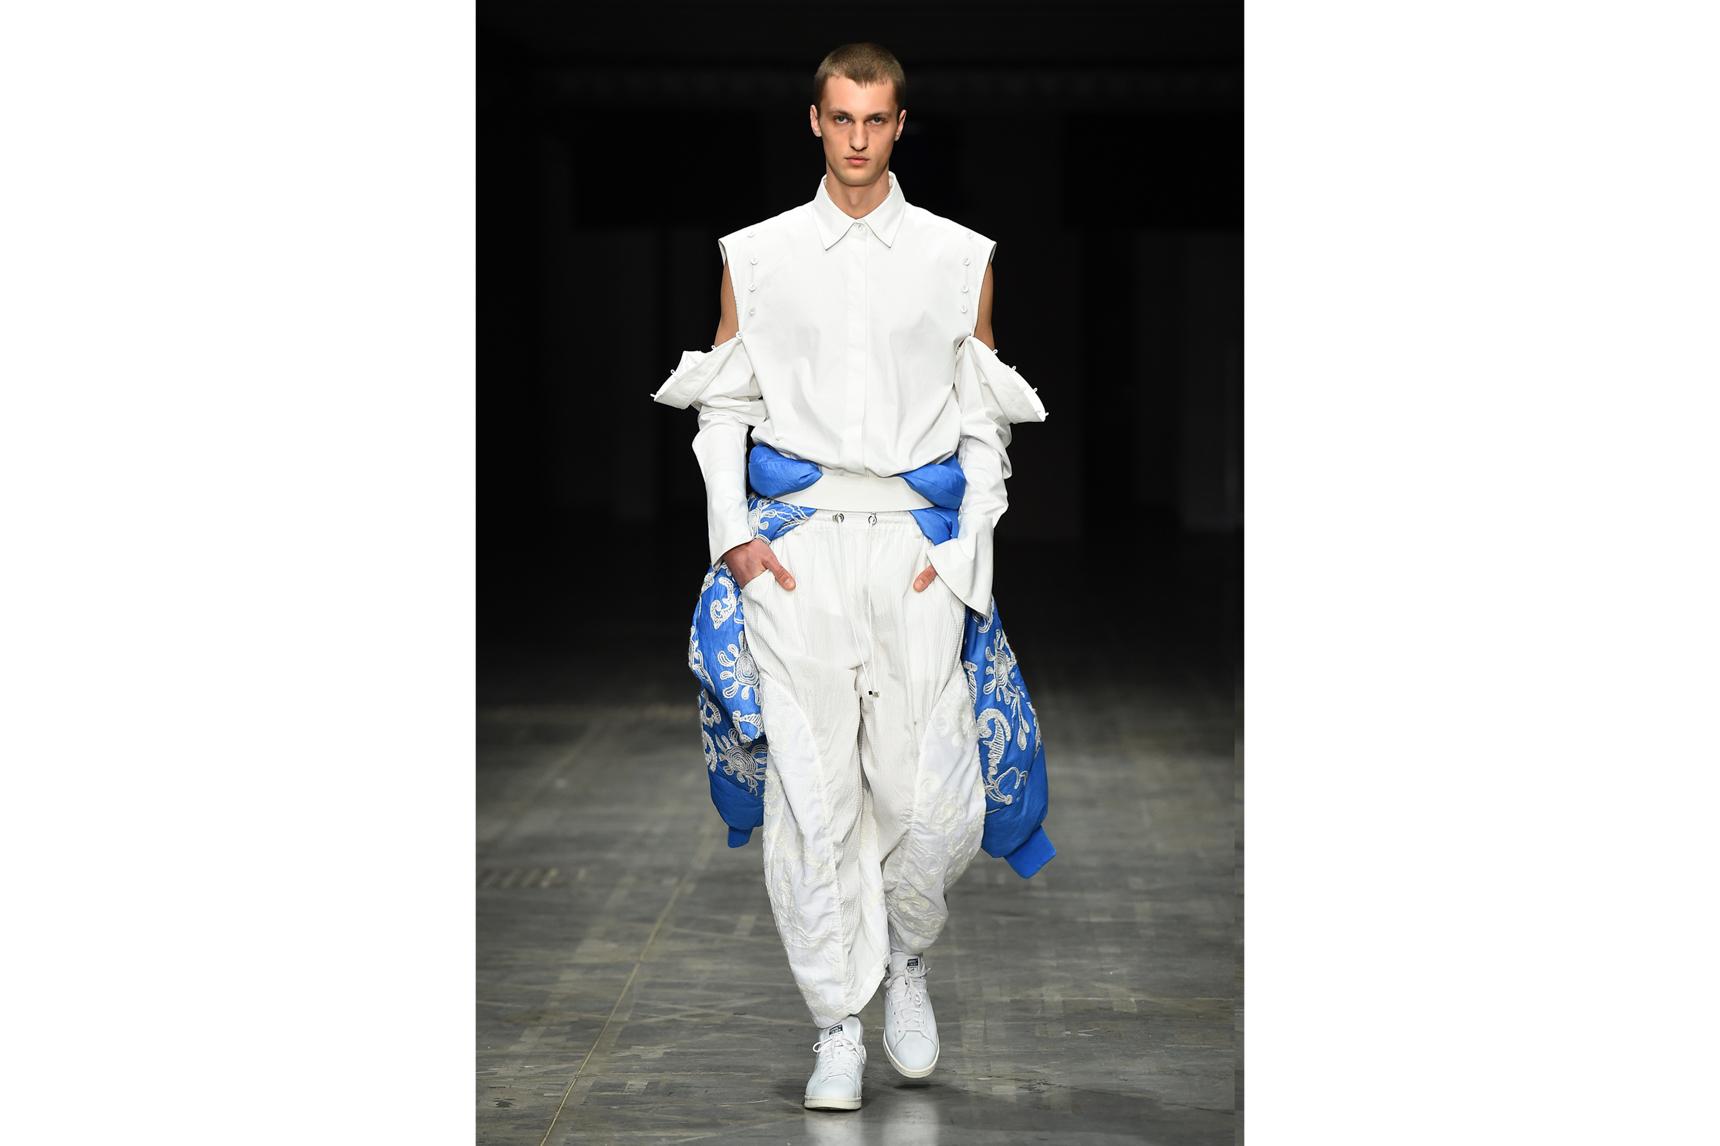 Angel Chen milano fashion show look 4-Edit.jpg